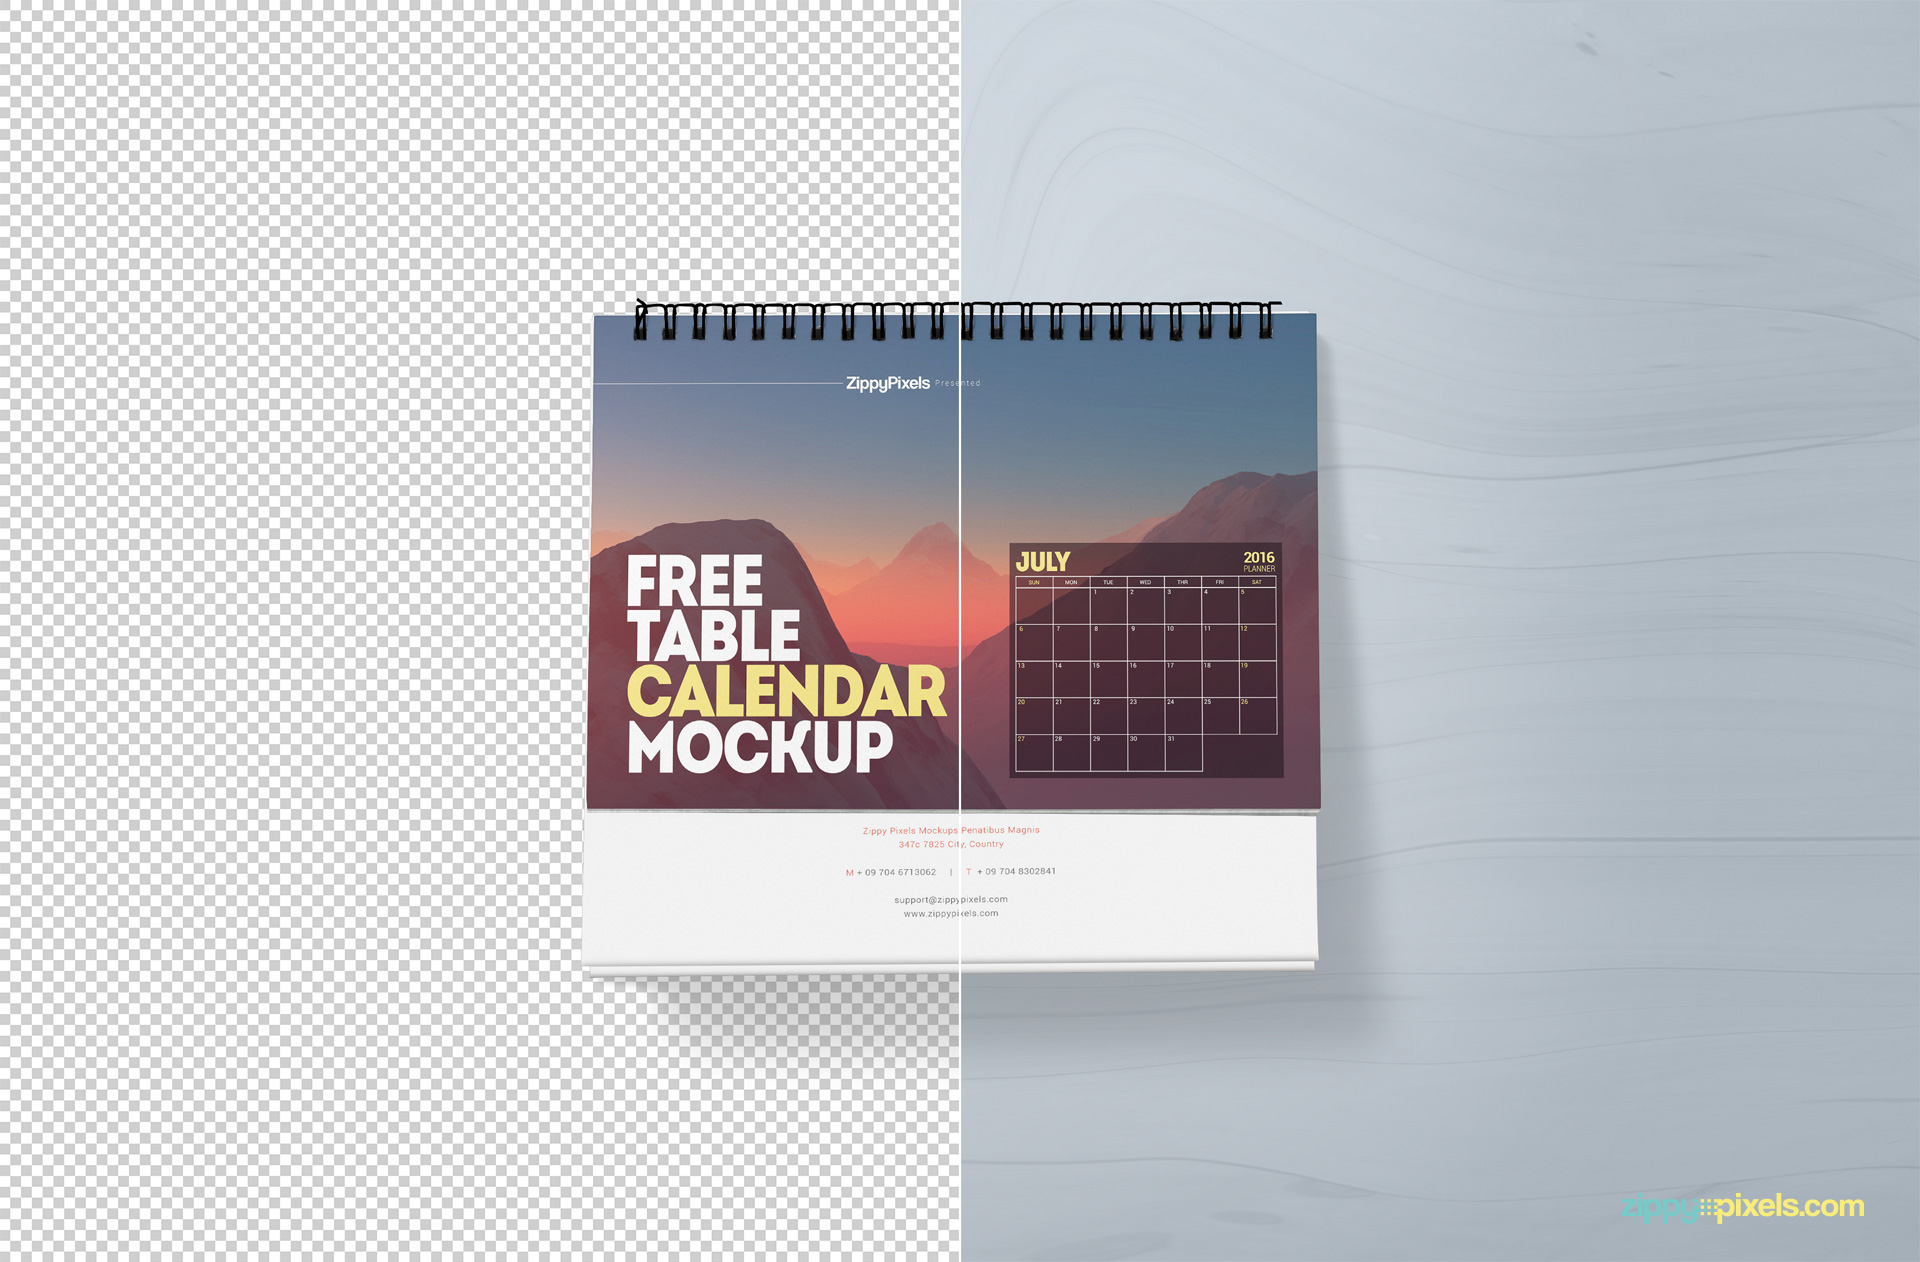 Free Desk Calendar Mock Up In Psd File Format